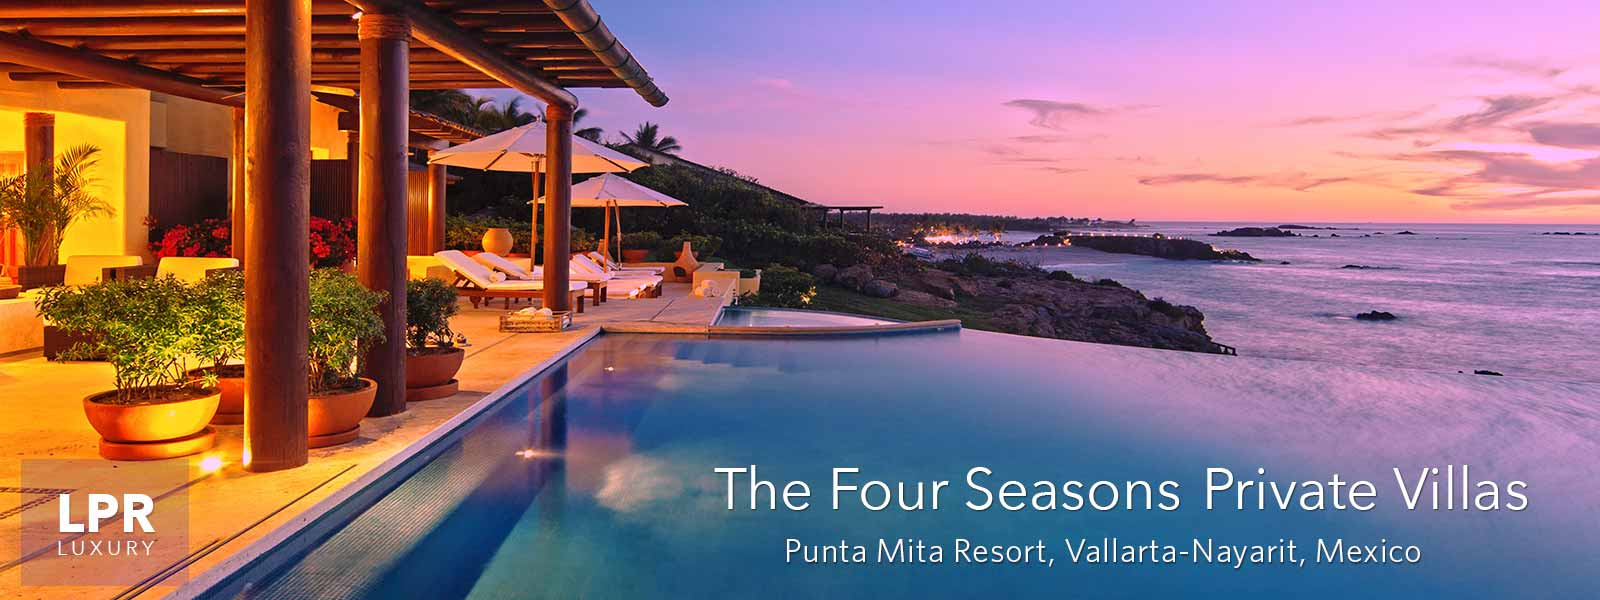 The Four Seasons Private Villas - Luxury Punta Mita Real Estate and Vacation Villa Rentals